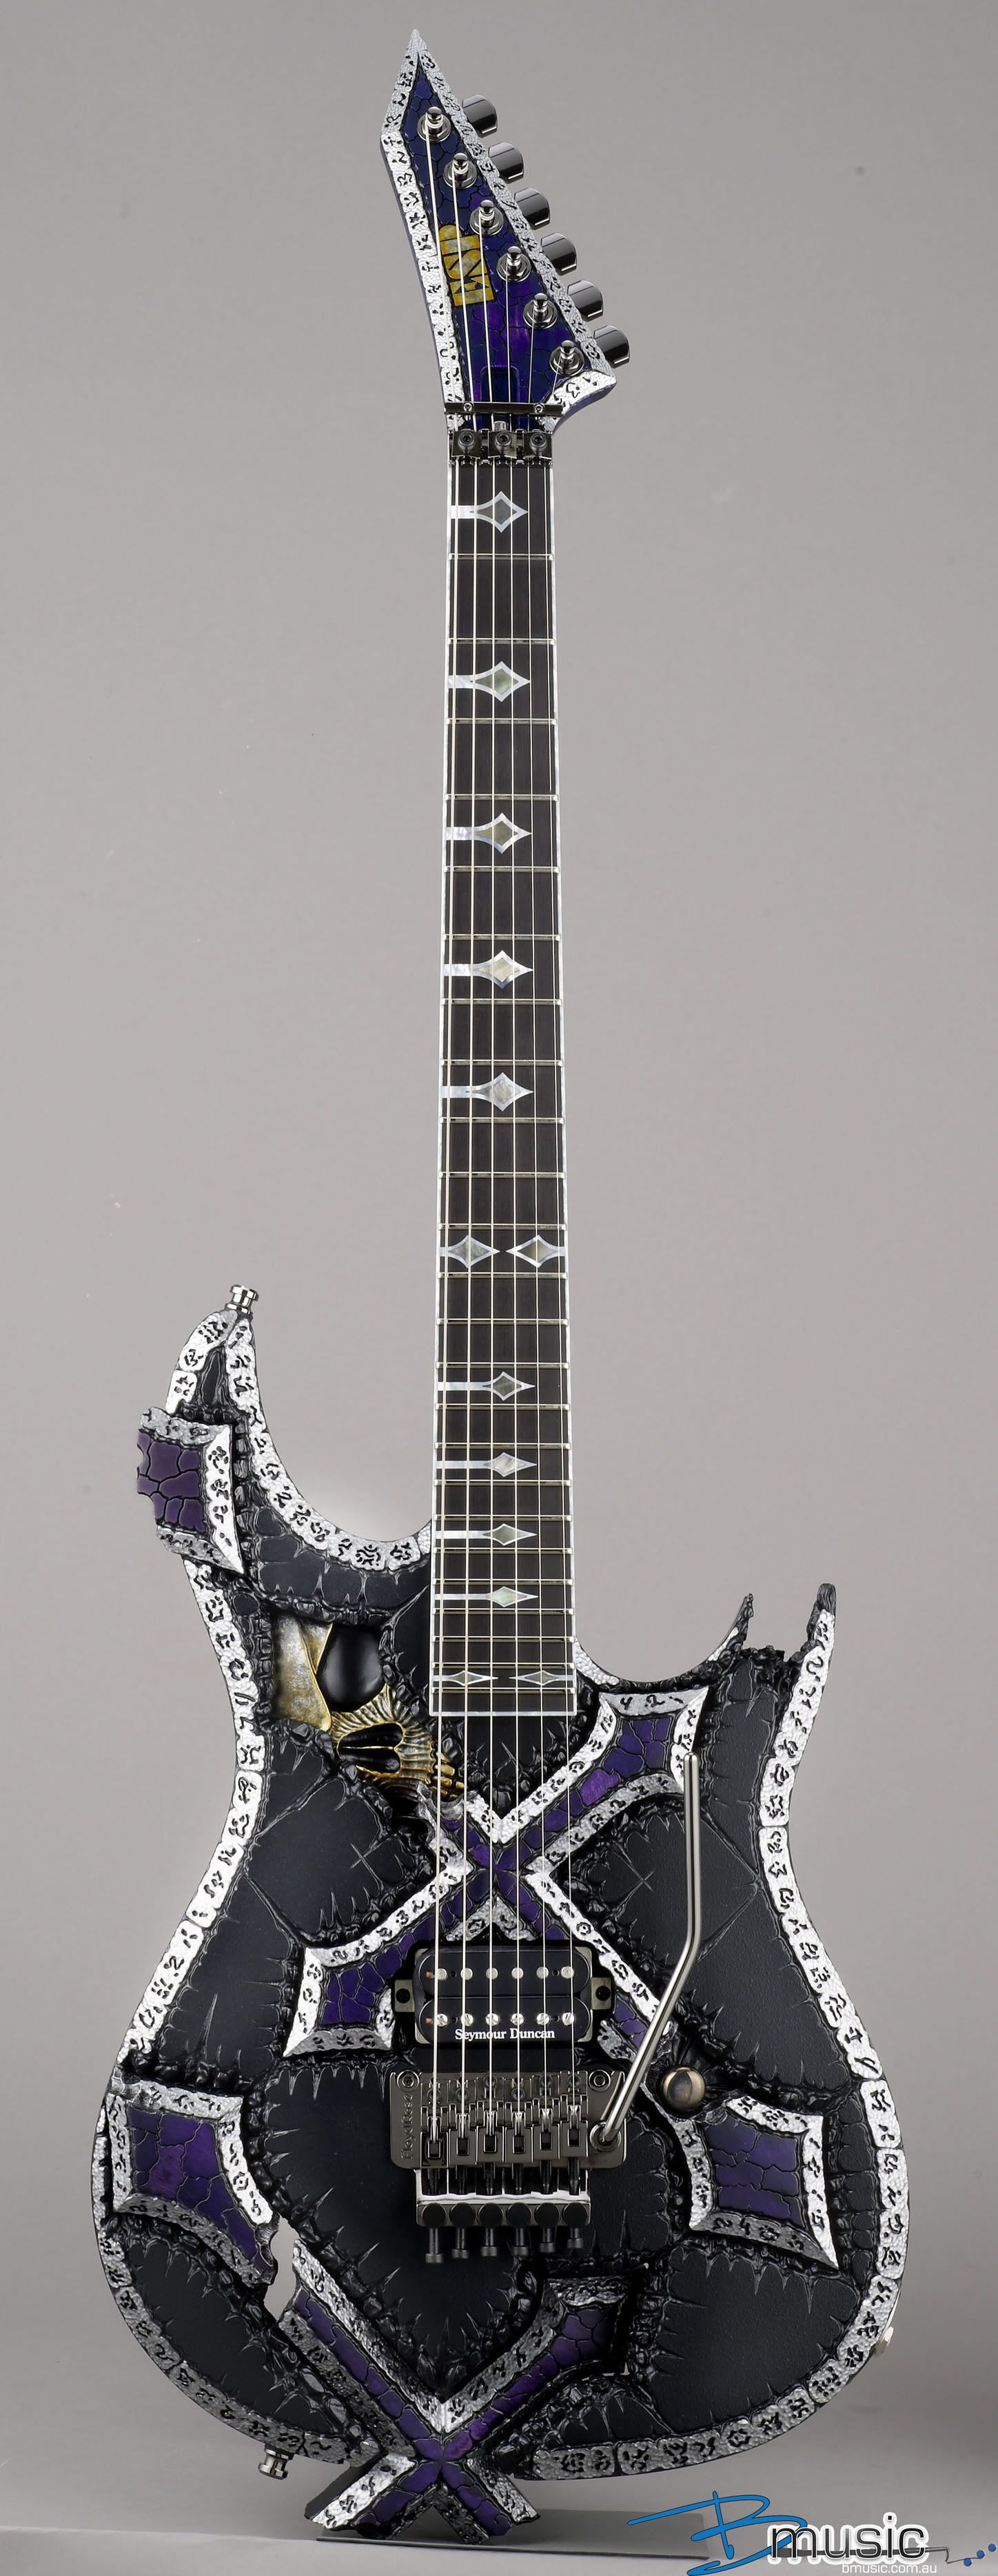 esp kizoku custom electric guitar we buy sell trade guitar pinterest. Black Bedroom Furniture Sets. Home Design Ideas